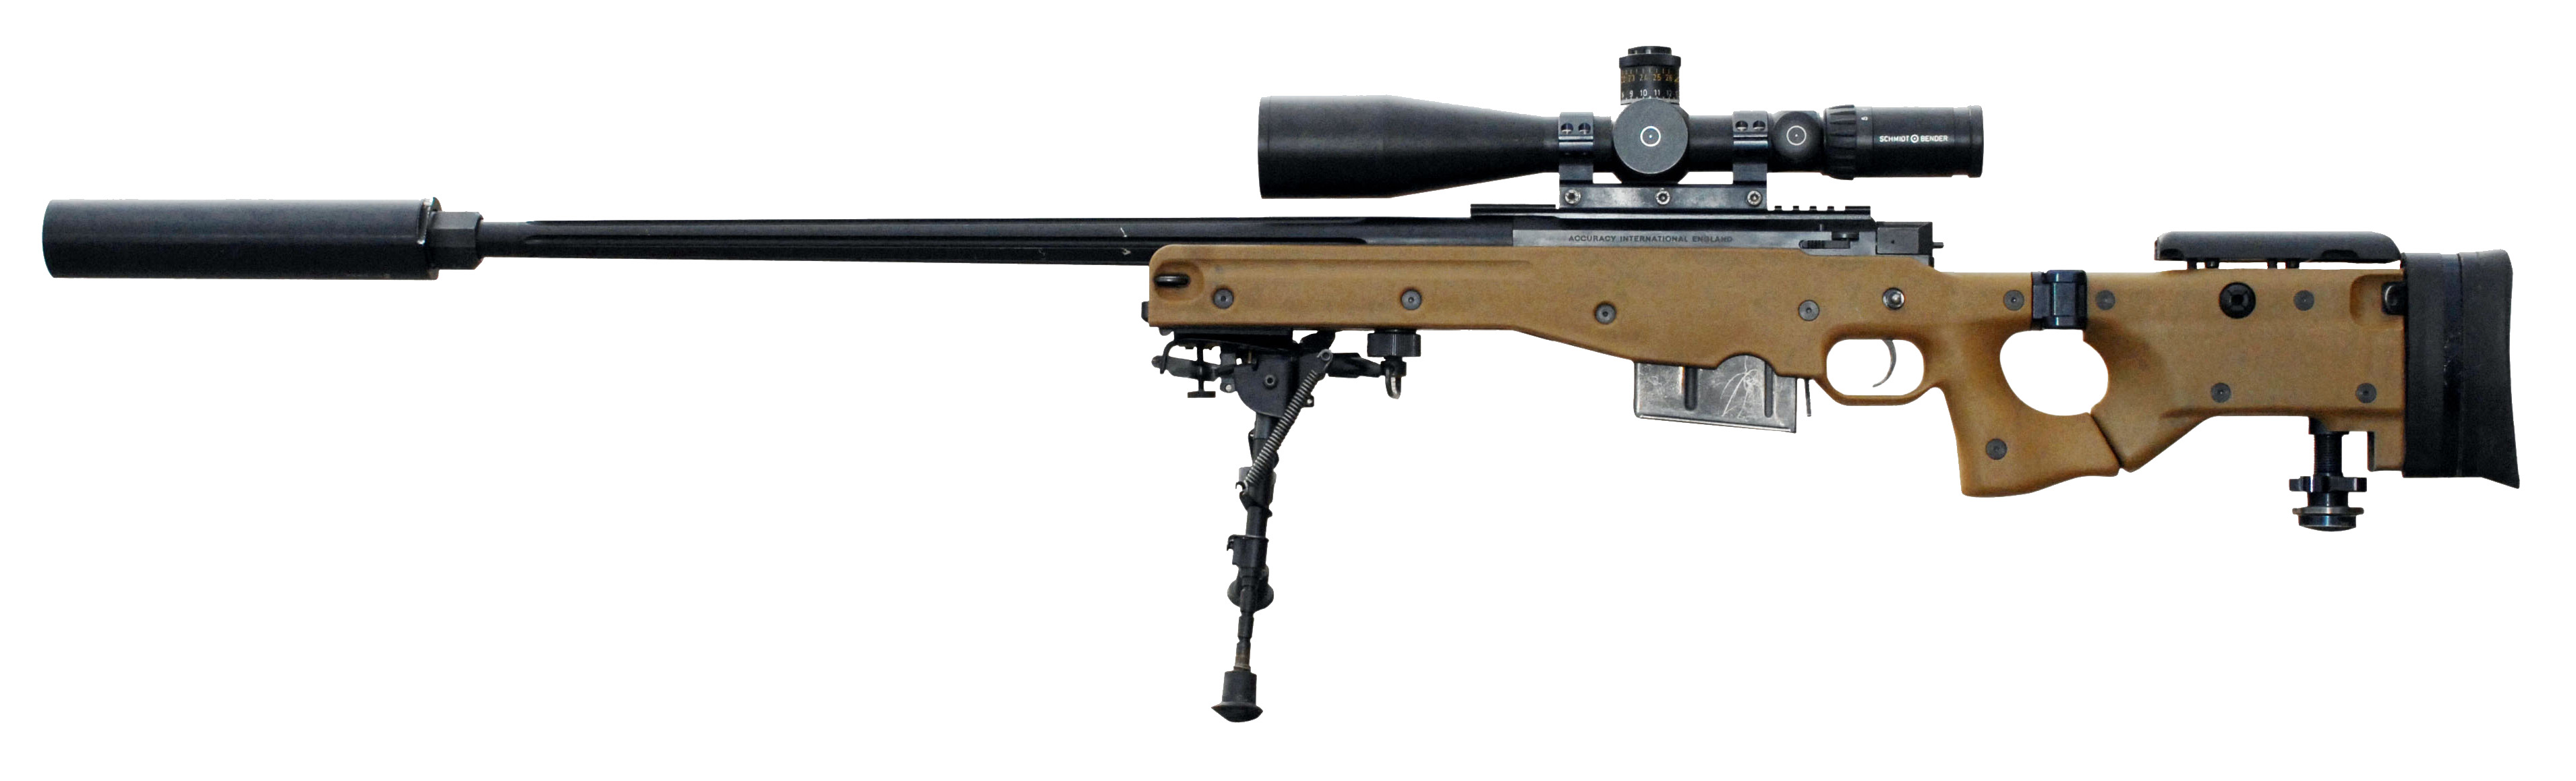 File L115a3 Sniper Rifle Jpg Wikimedia Commons